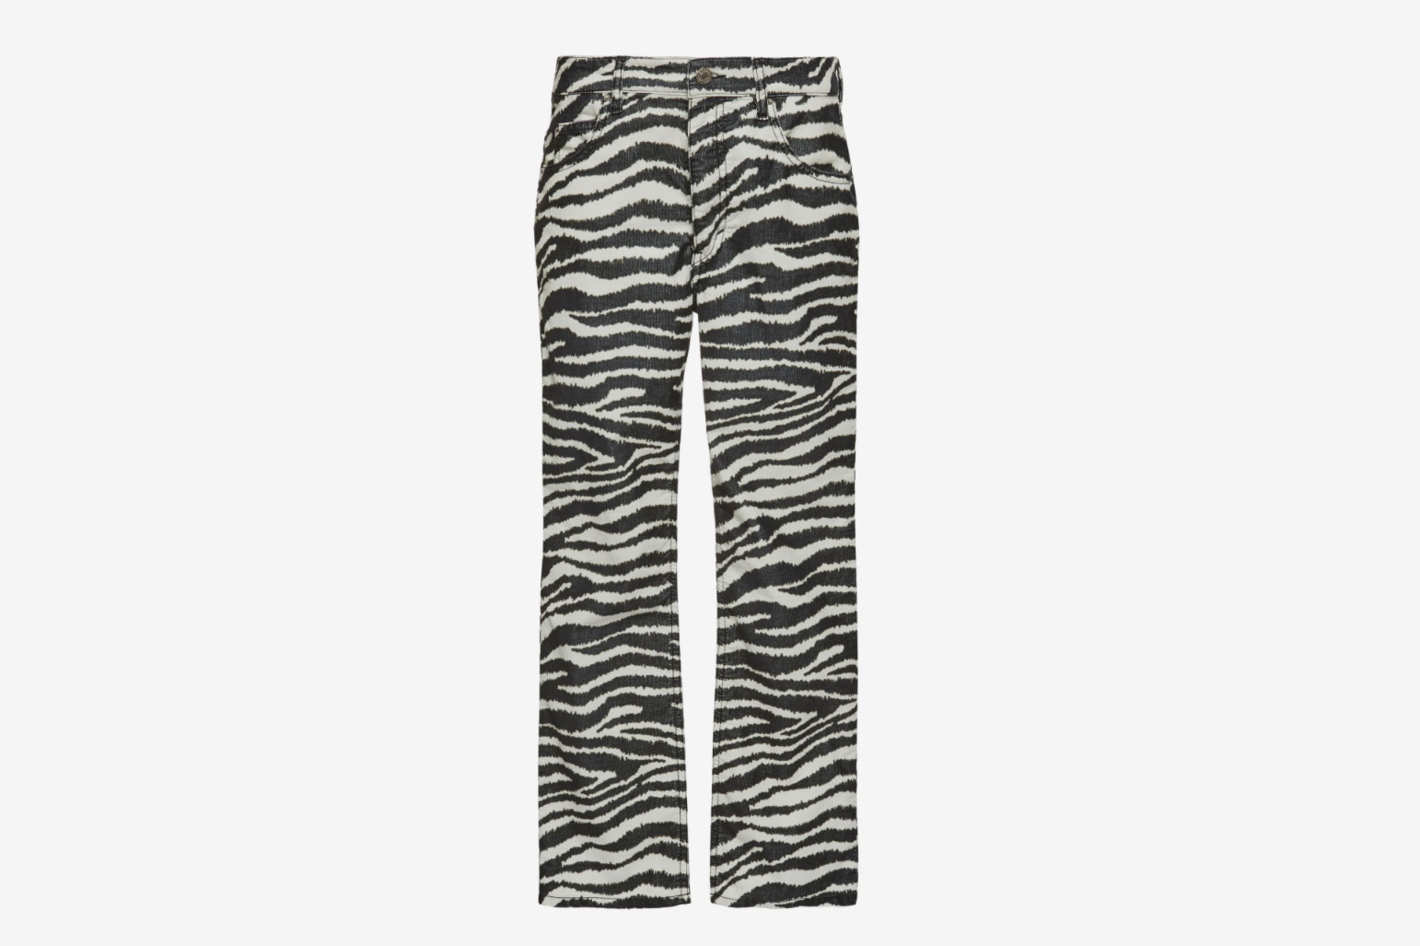 Isabel Marant Étoile Apolo Animal-Print Stretch Pants